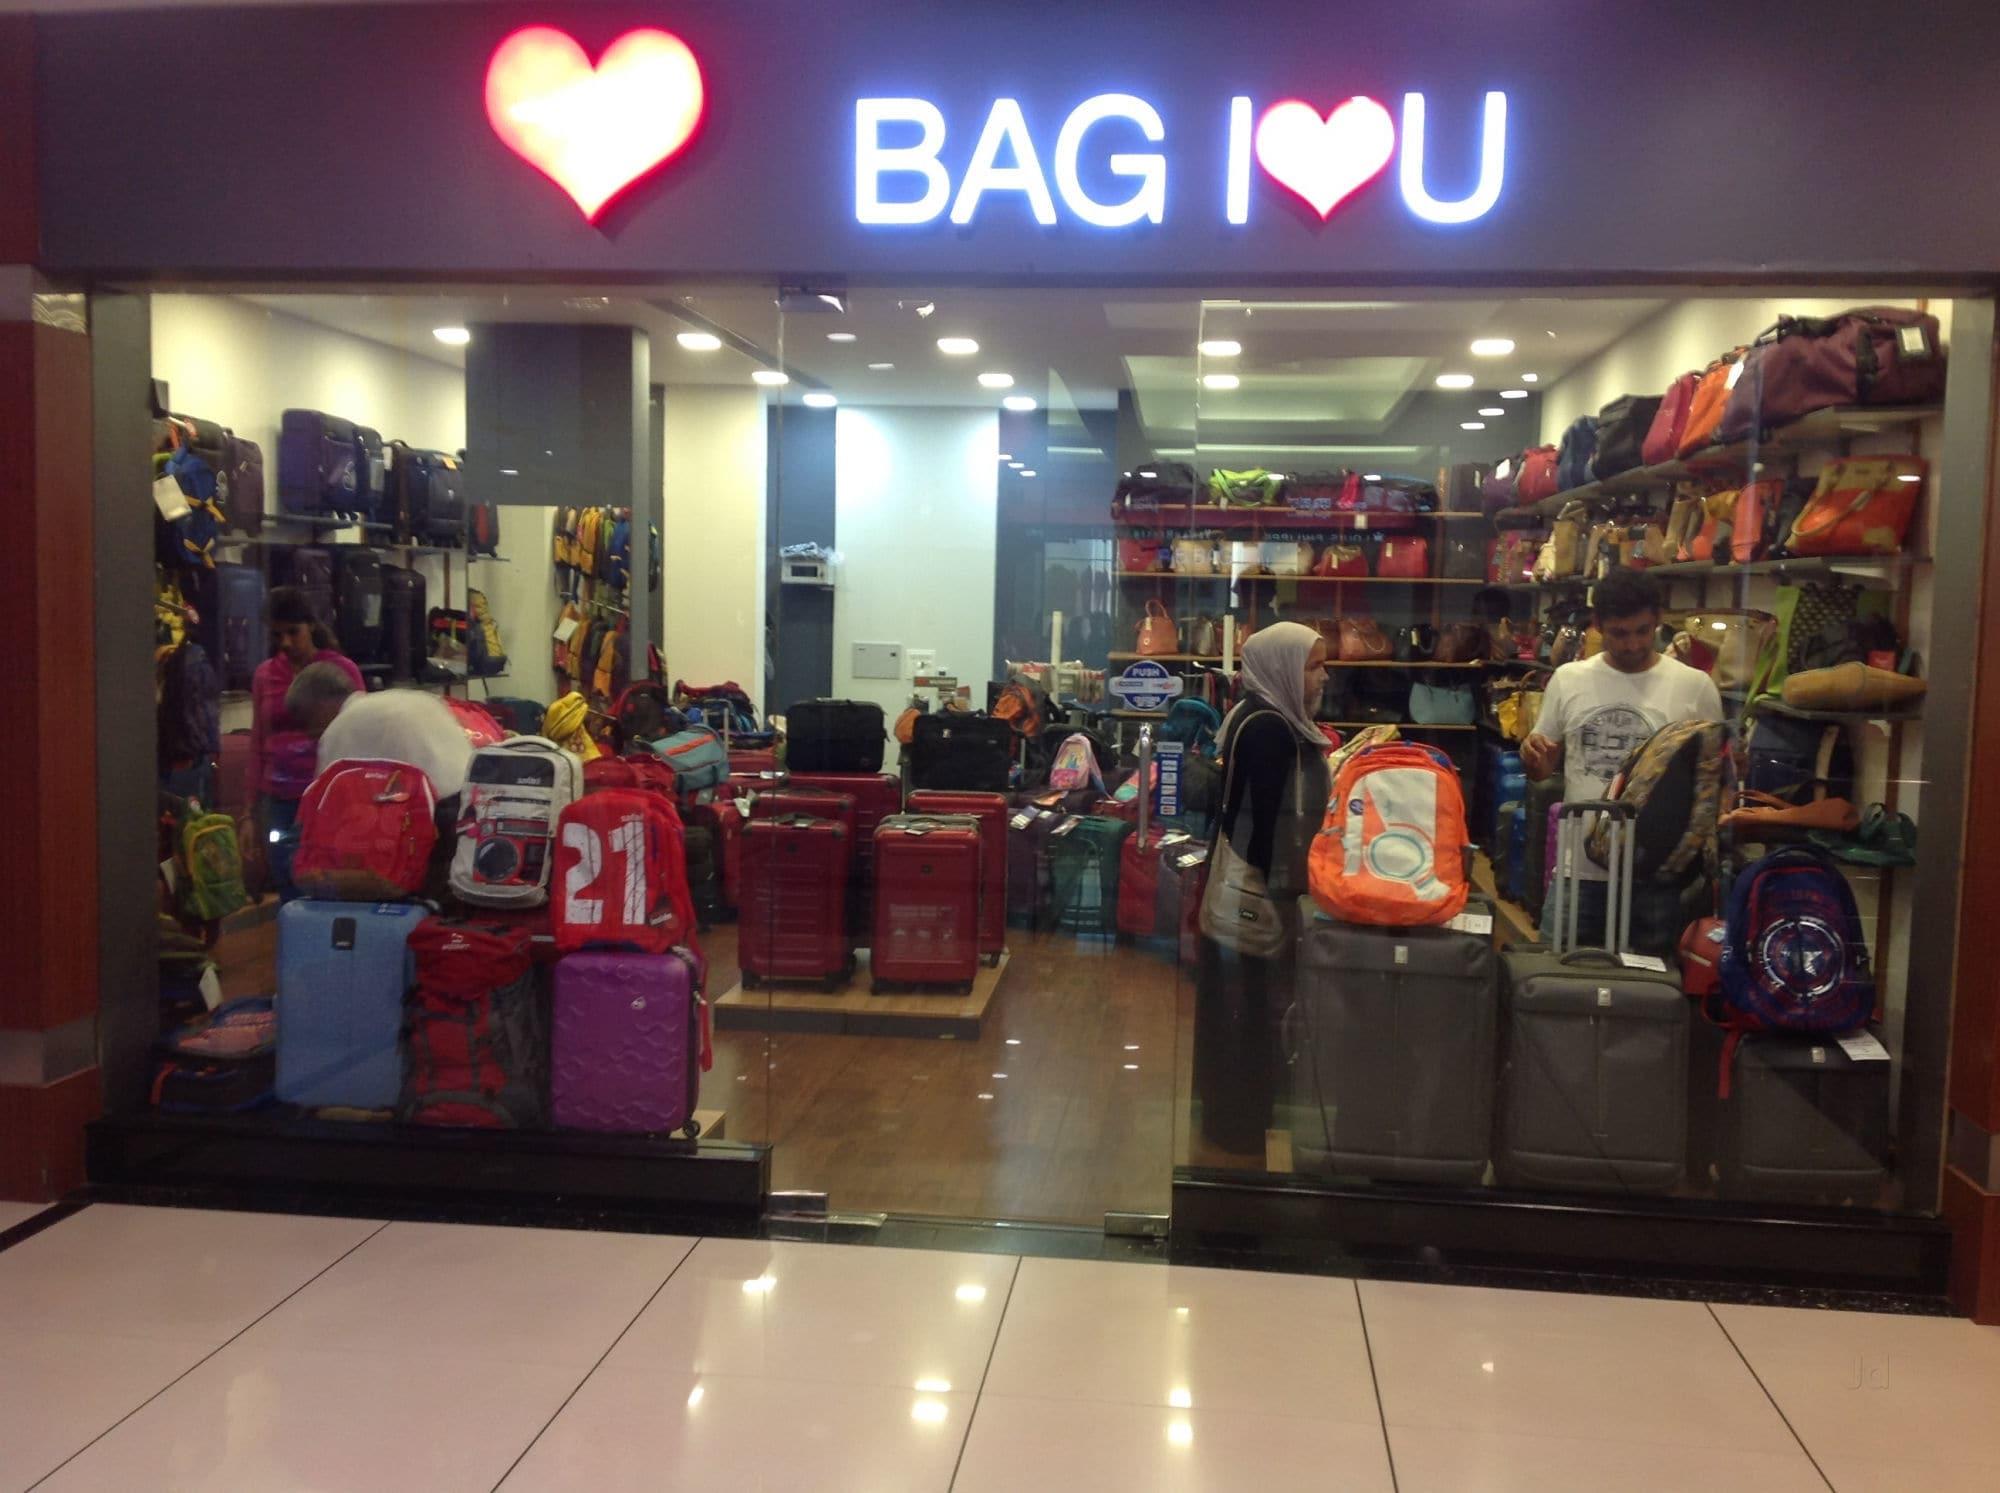 8f4efafcf0 Top 100 Bag Dealers in Mangalore - Best Bag Retailers - Justdial